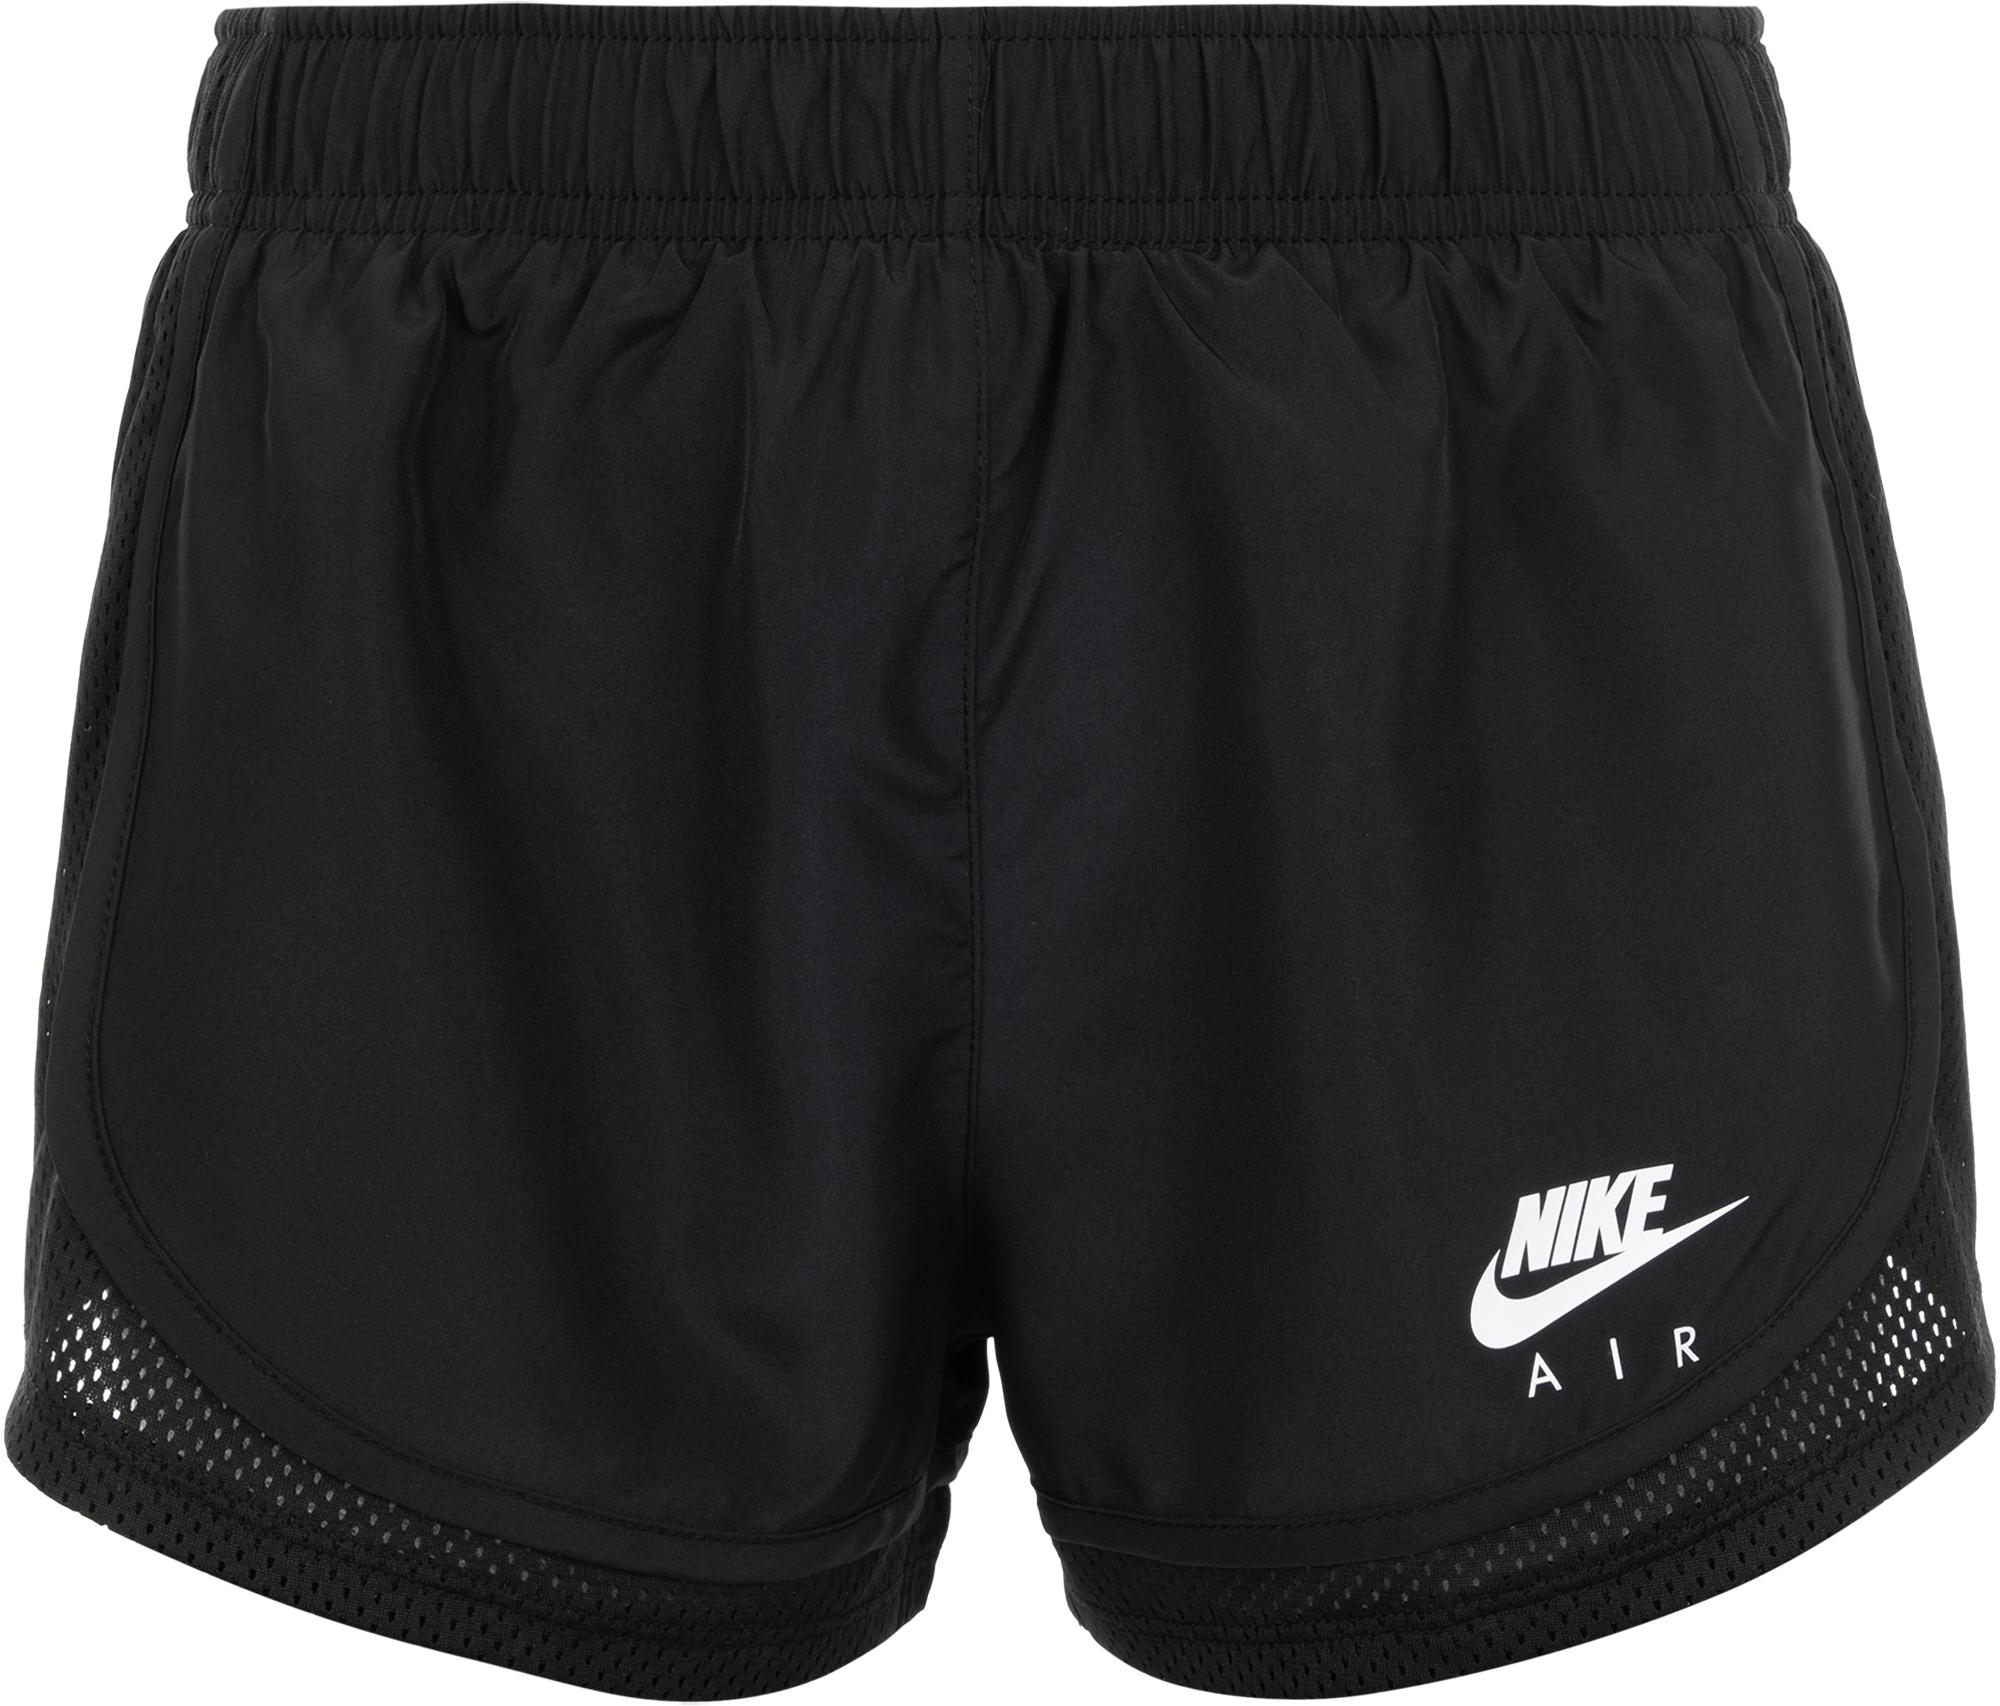 цена на Nike Шорты женские Nike Air Tempo, размер 46-48